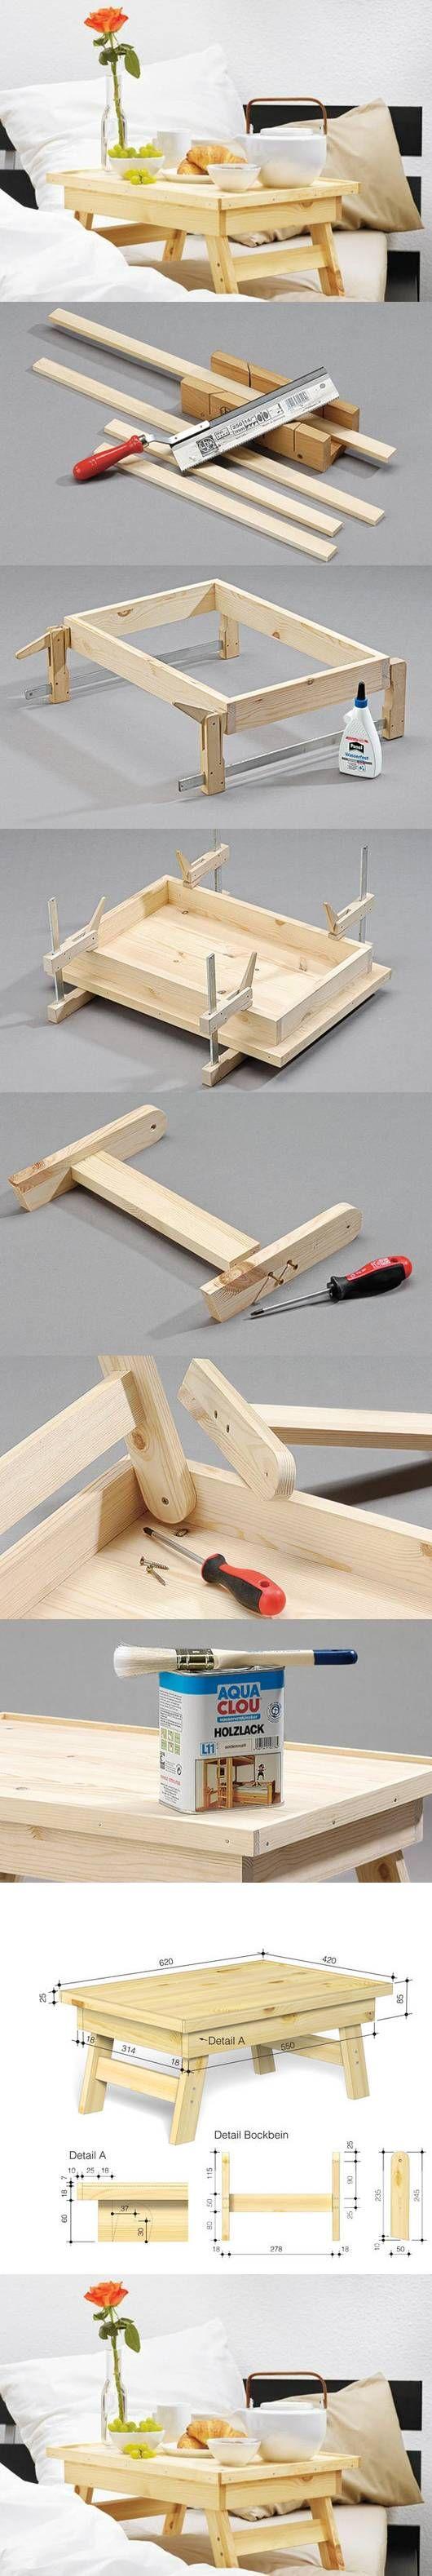 DIY Simple Bed Tray | iCreativeIdeas.com Like Us on Facebook ==> https://www.facebook.com/icreativeideas